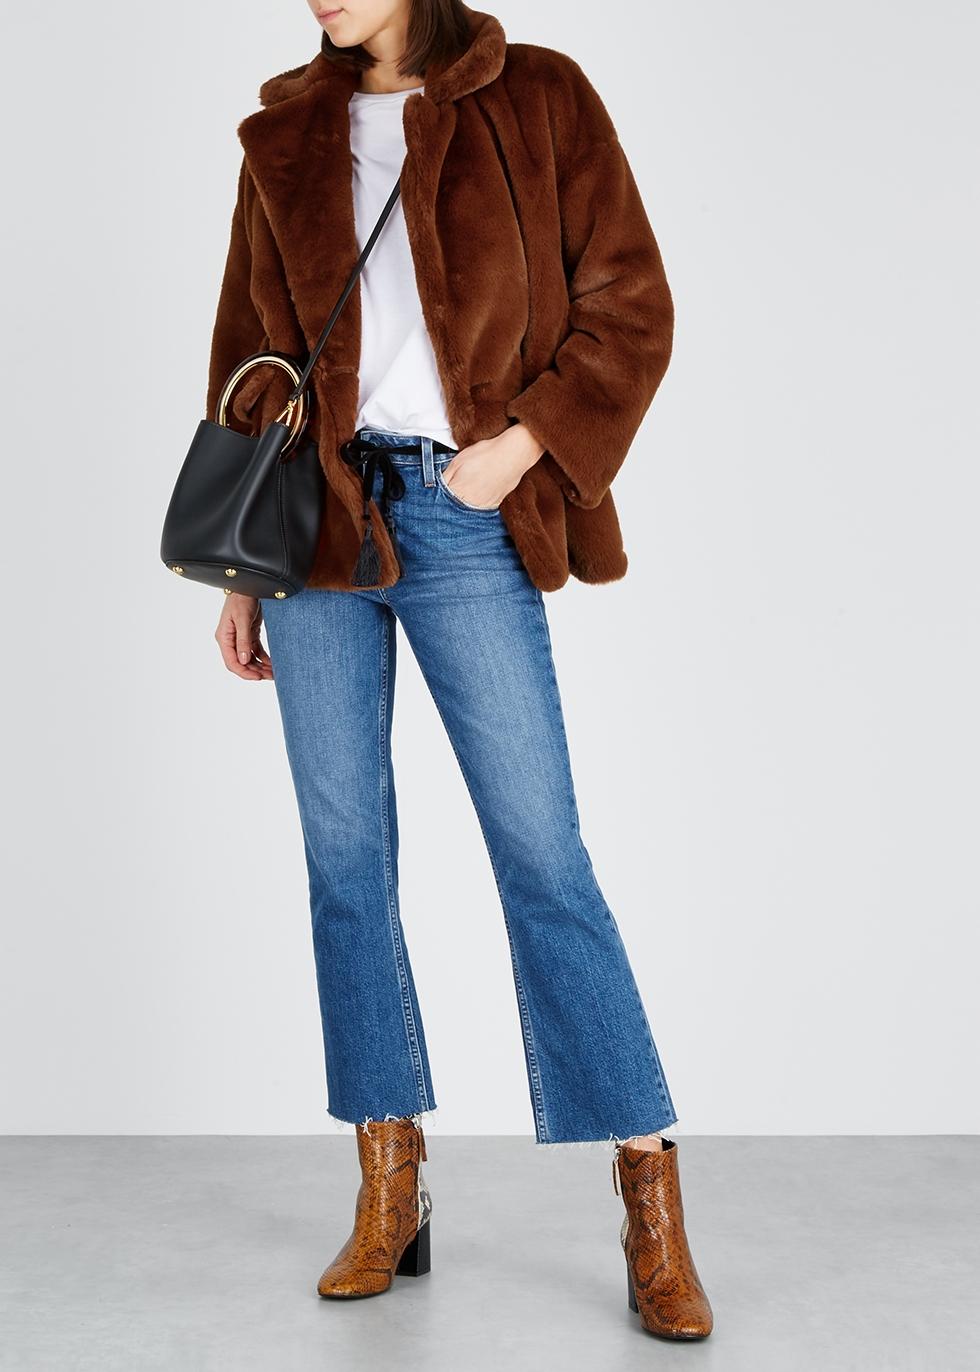 Designer Coats Women S Winter Coats Harvey Nichols